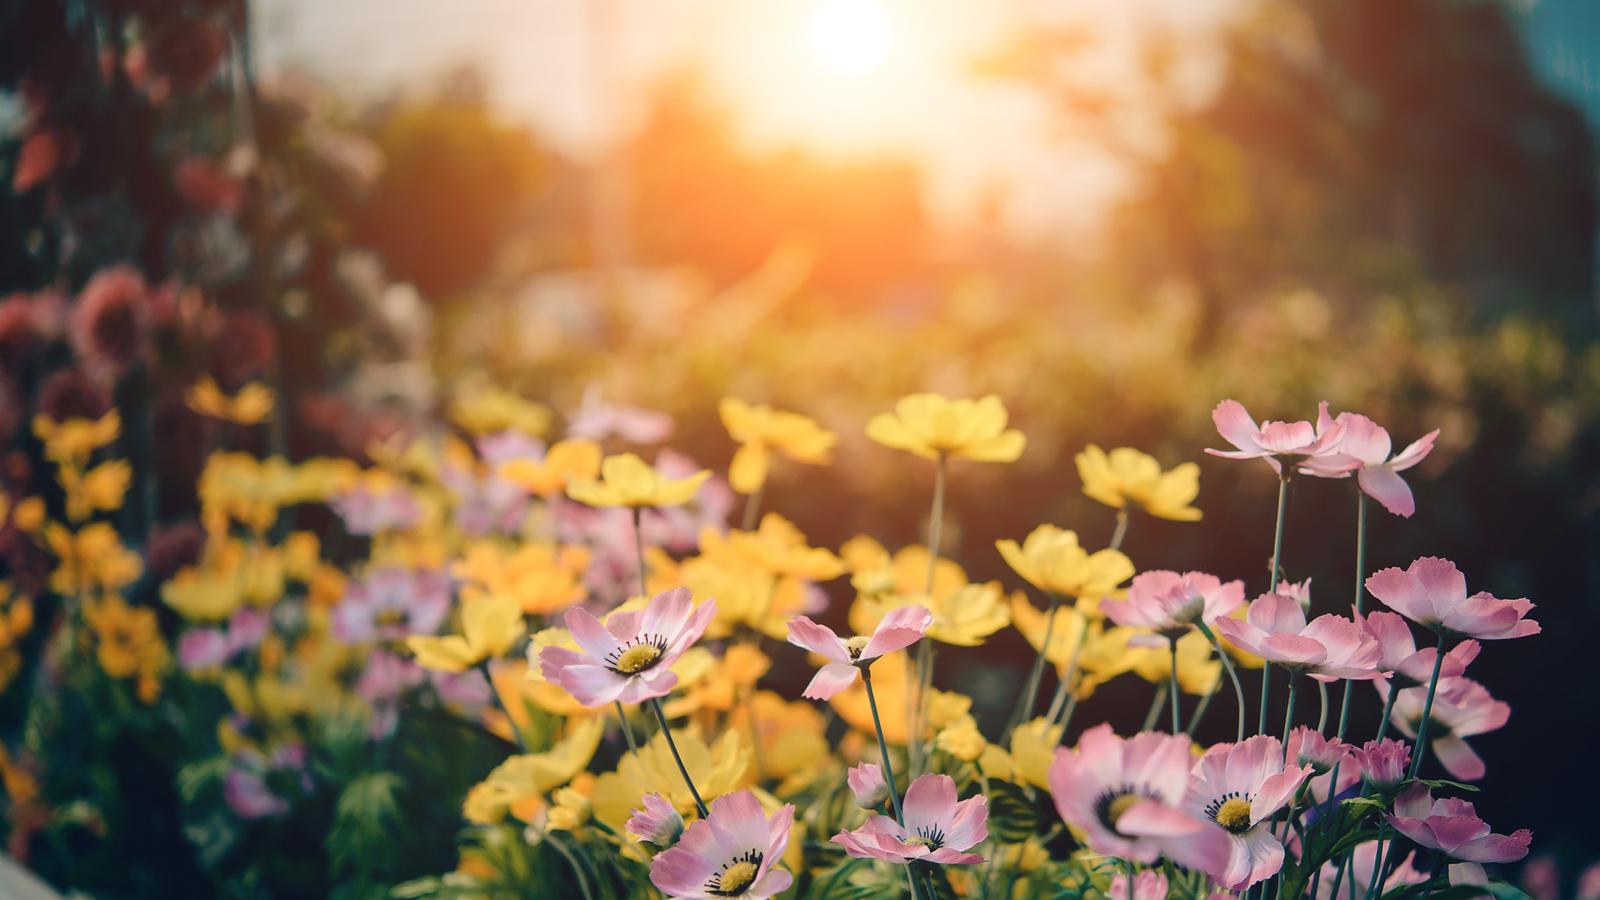 Primavera inicia nesta terça-feira no hemisfério sul